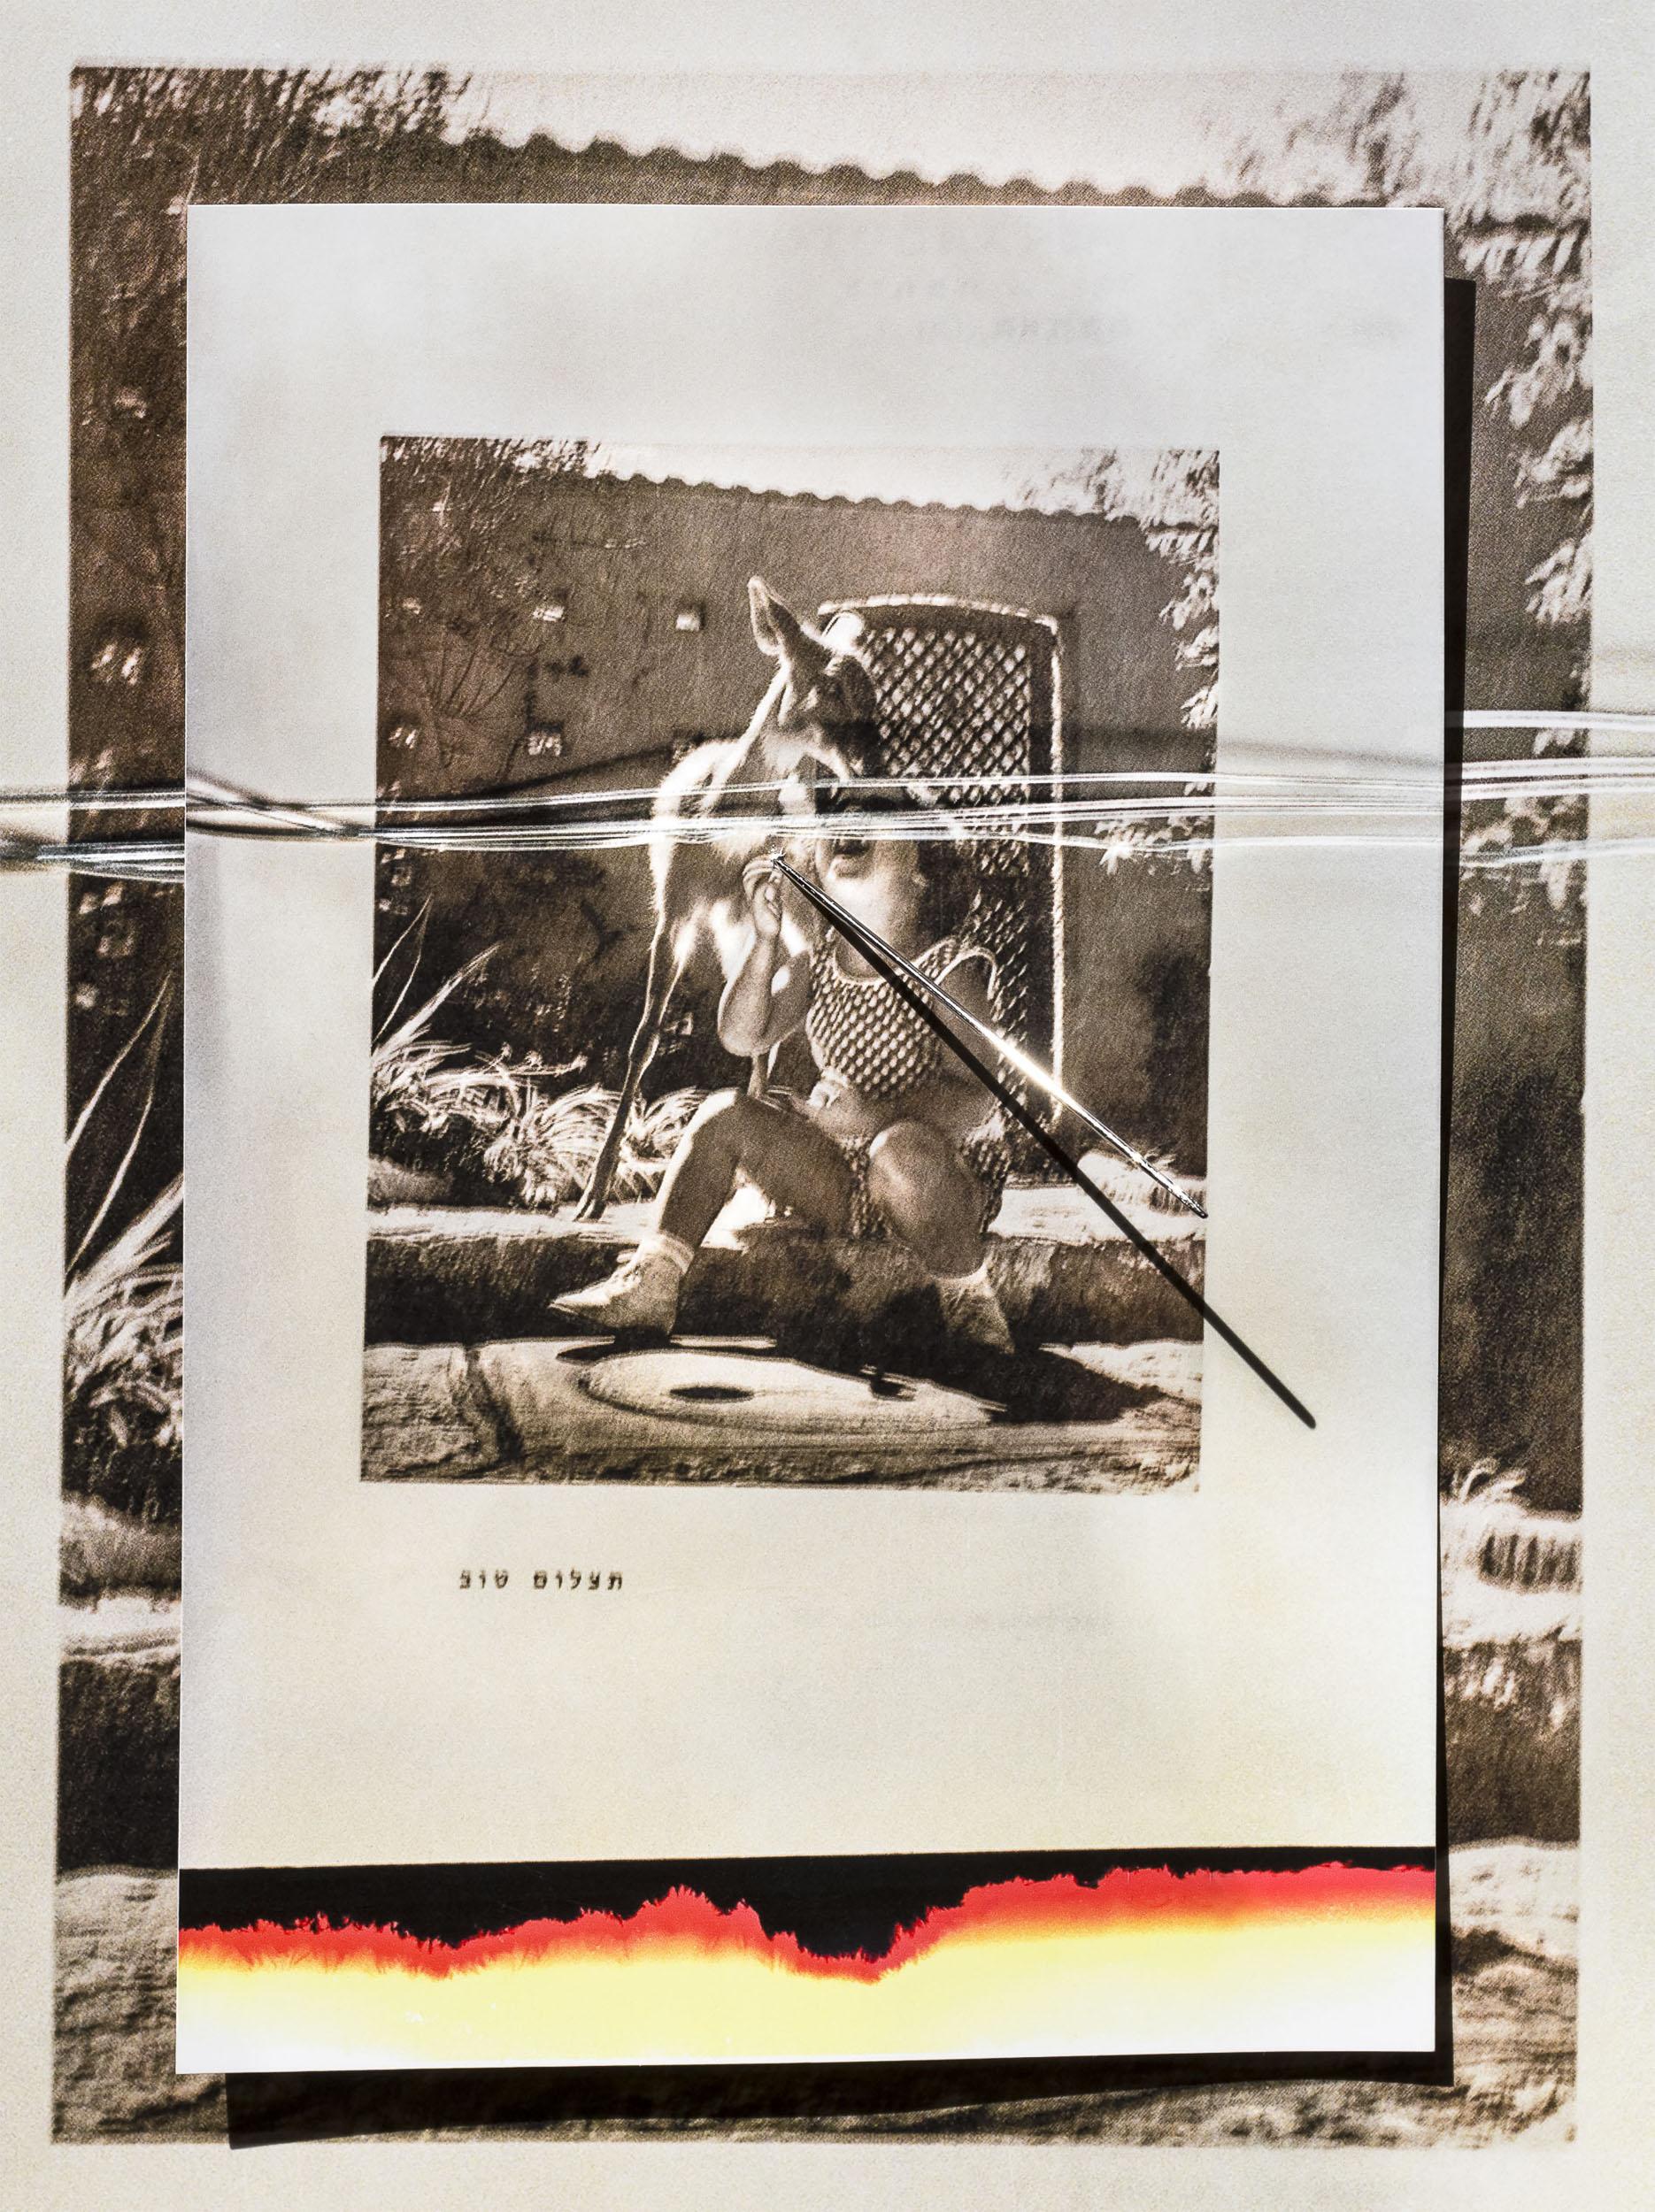 Bambi Girl (The Good Image), 27.5*20.4 inch, Archival Inkjet Print